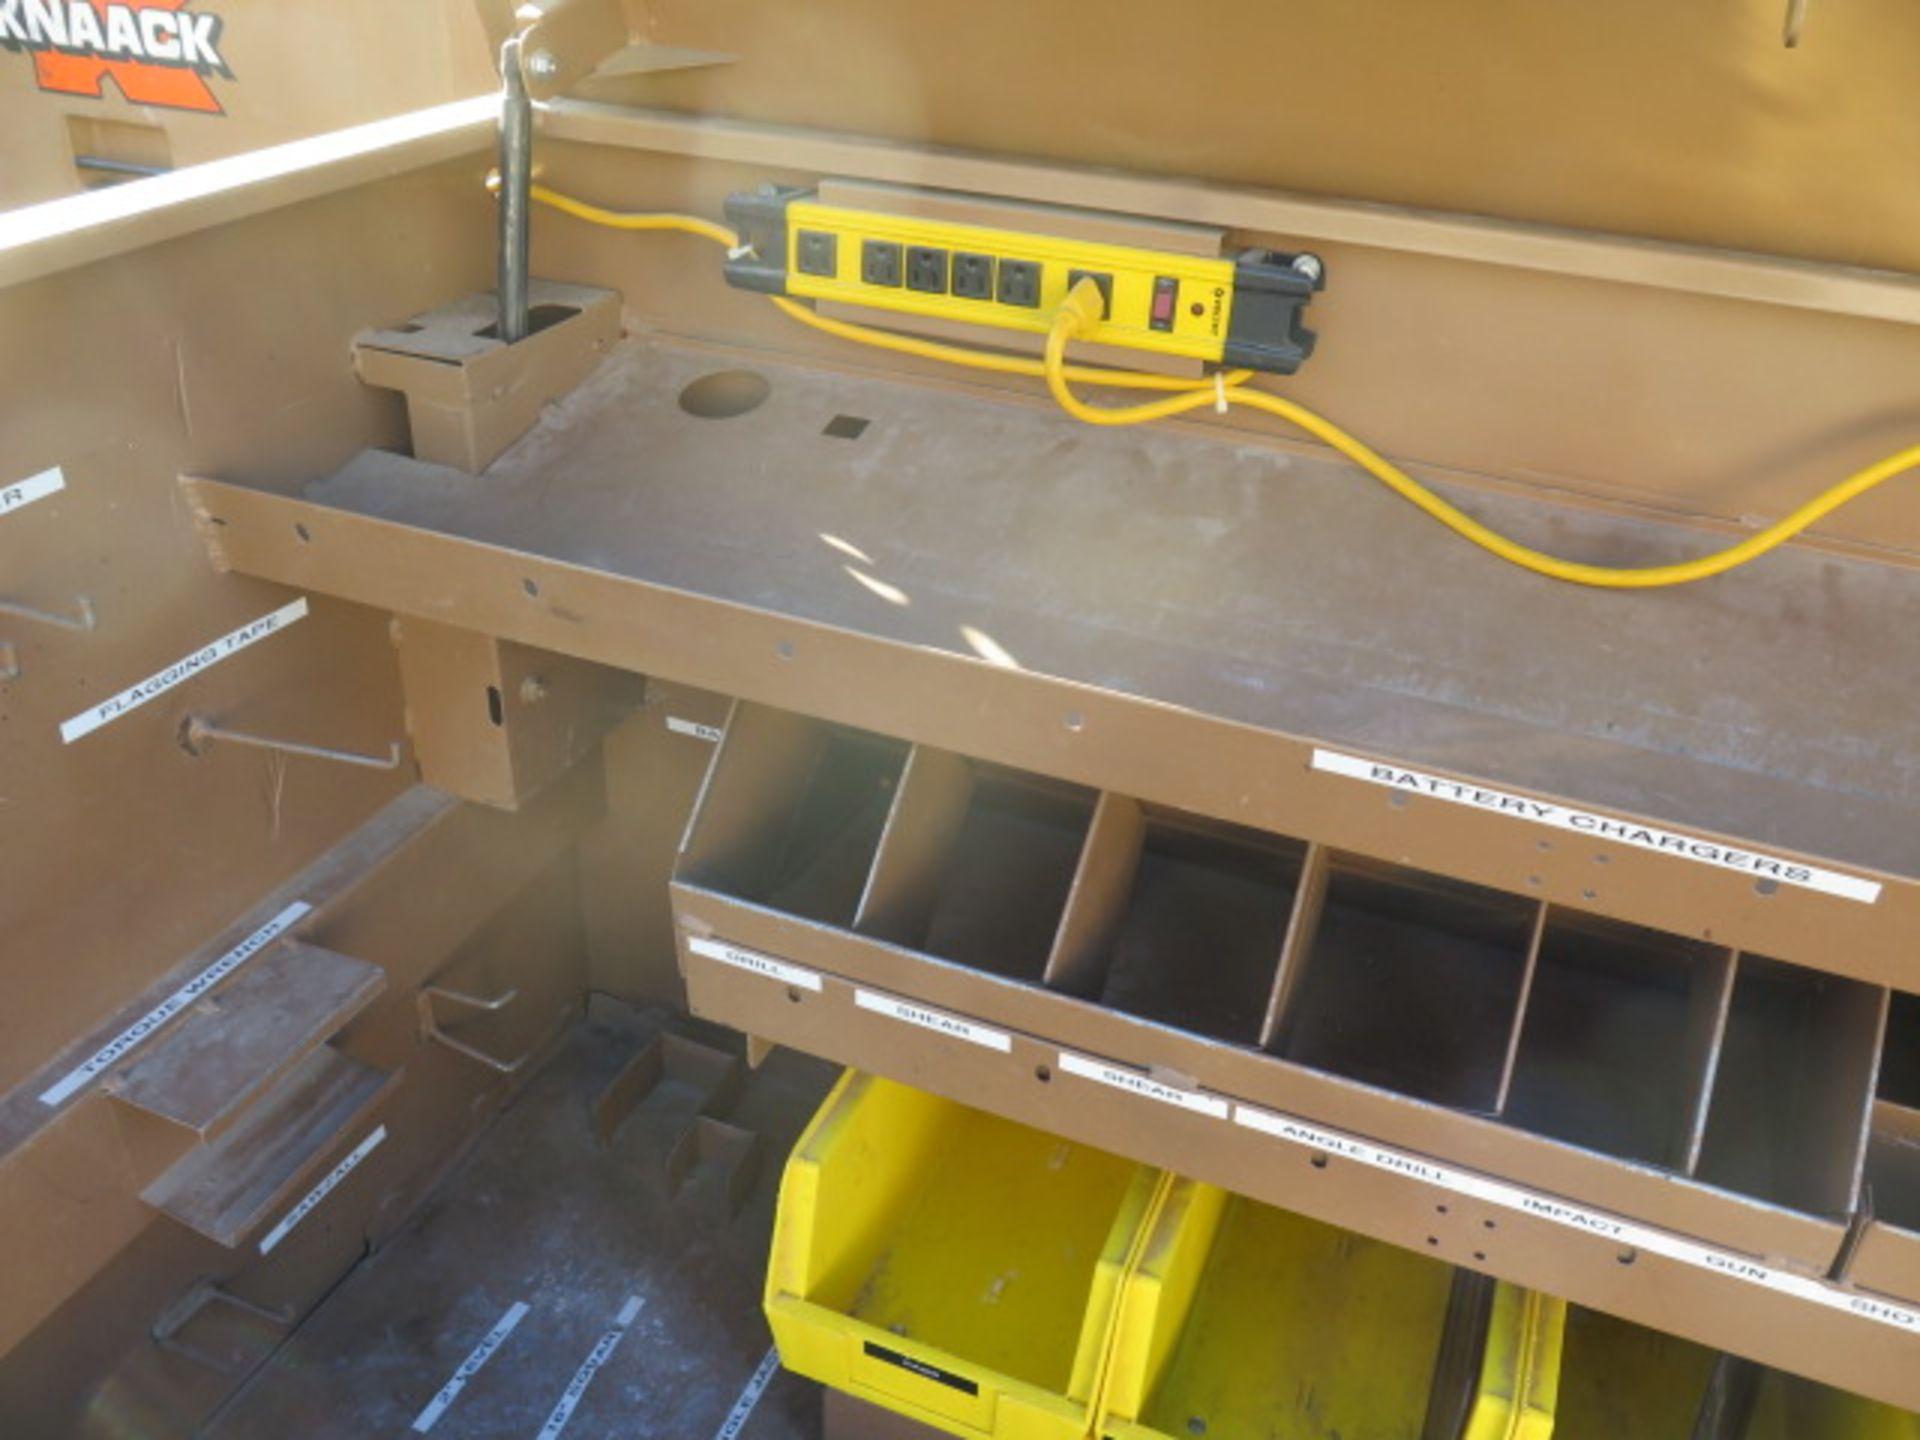 Knaack mdl. 89 Storagemaster Rolling Job Box (SOLD AS-IS - NO WARRANTY) - Image 5 of 12